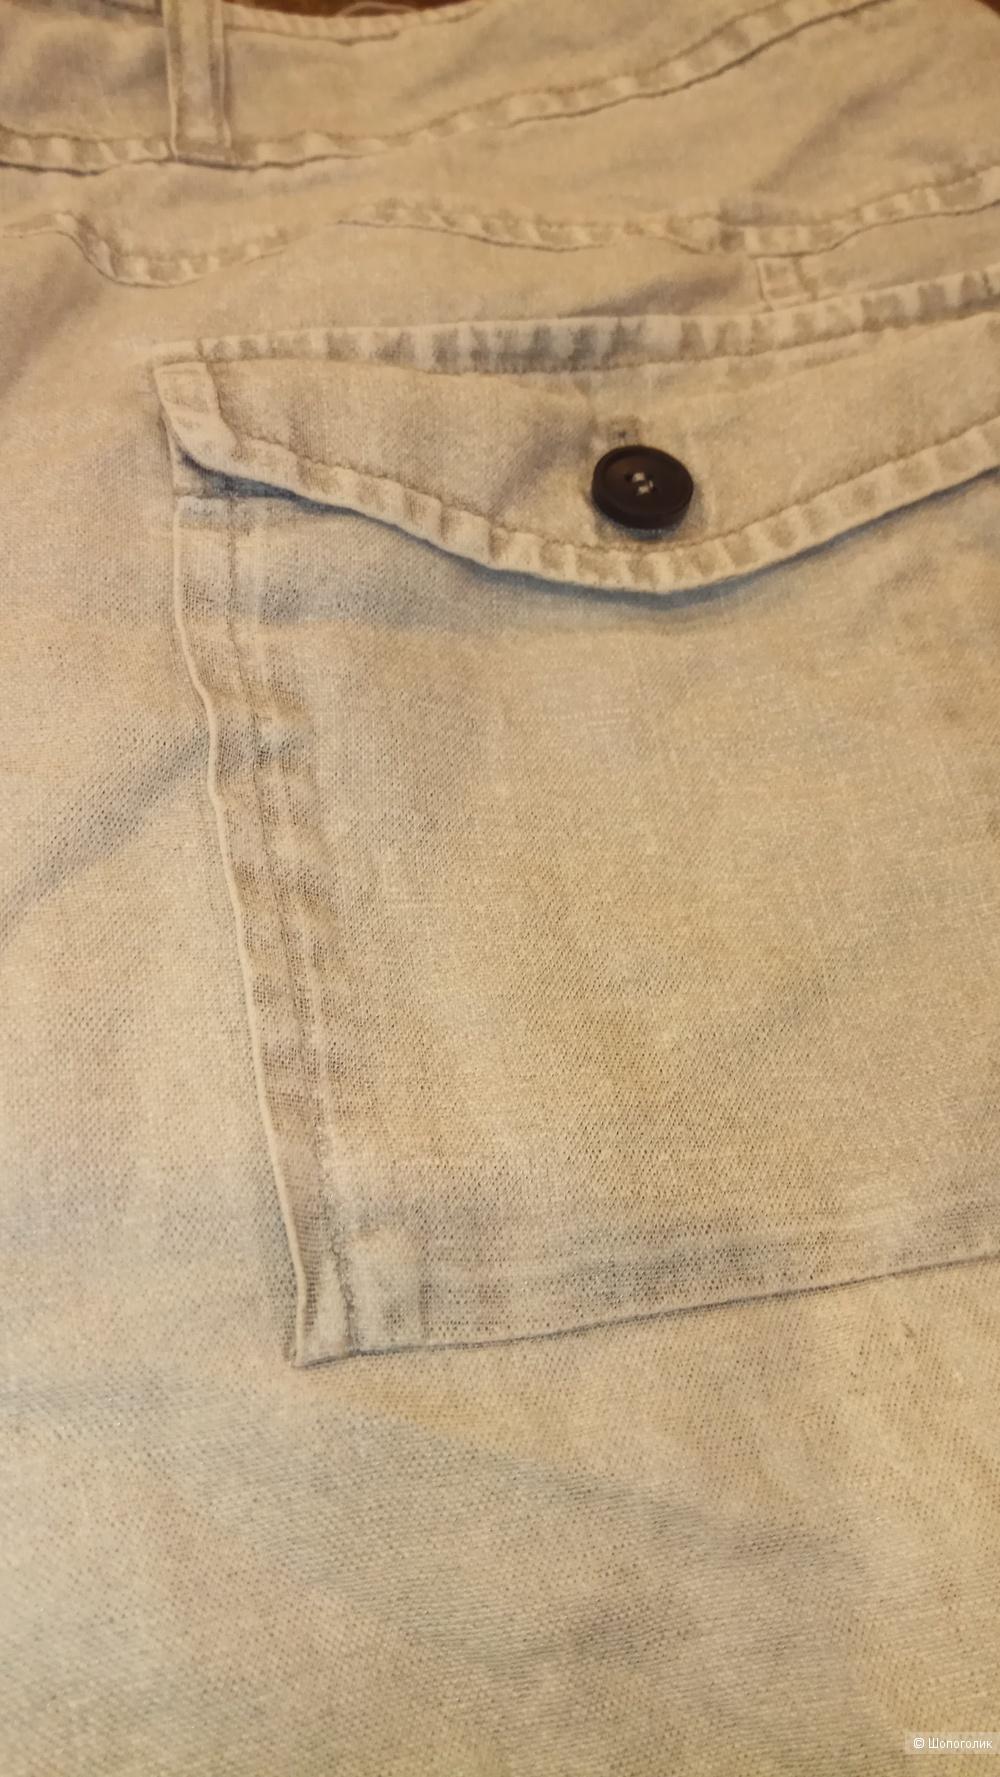 Брюки палаццо Strenesse blue размер 46/48